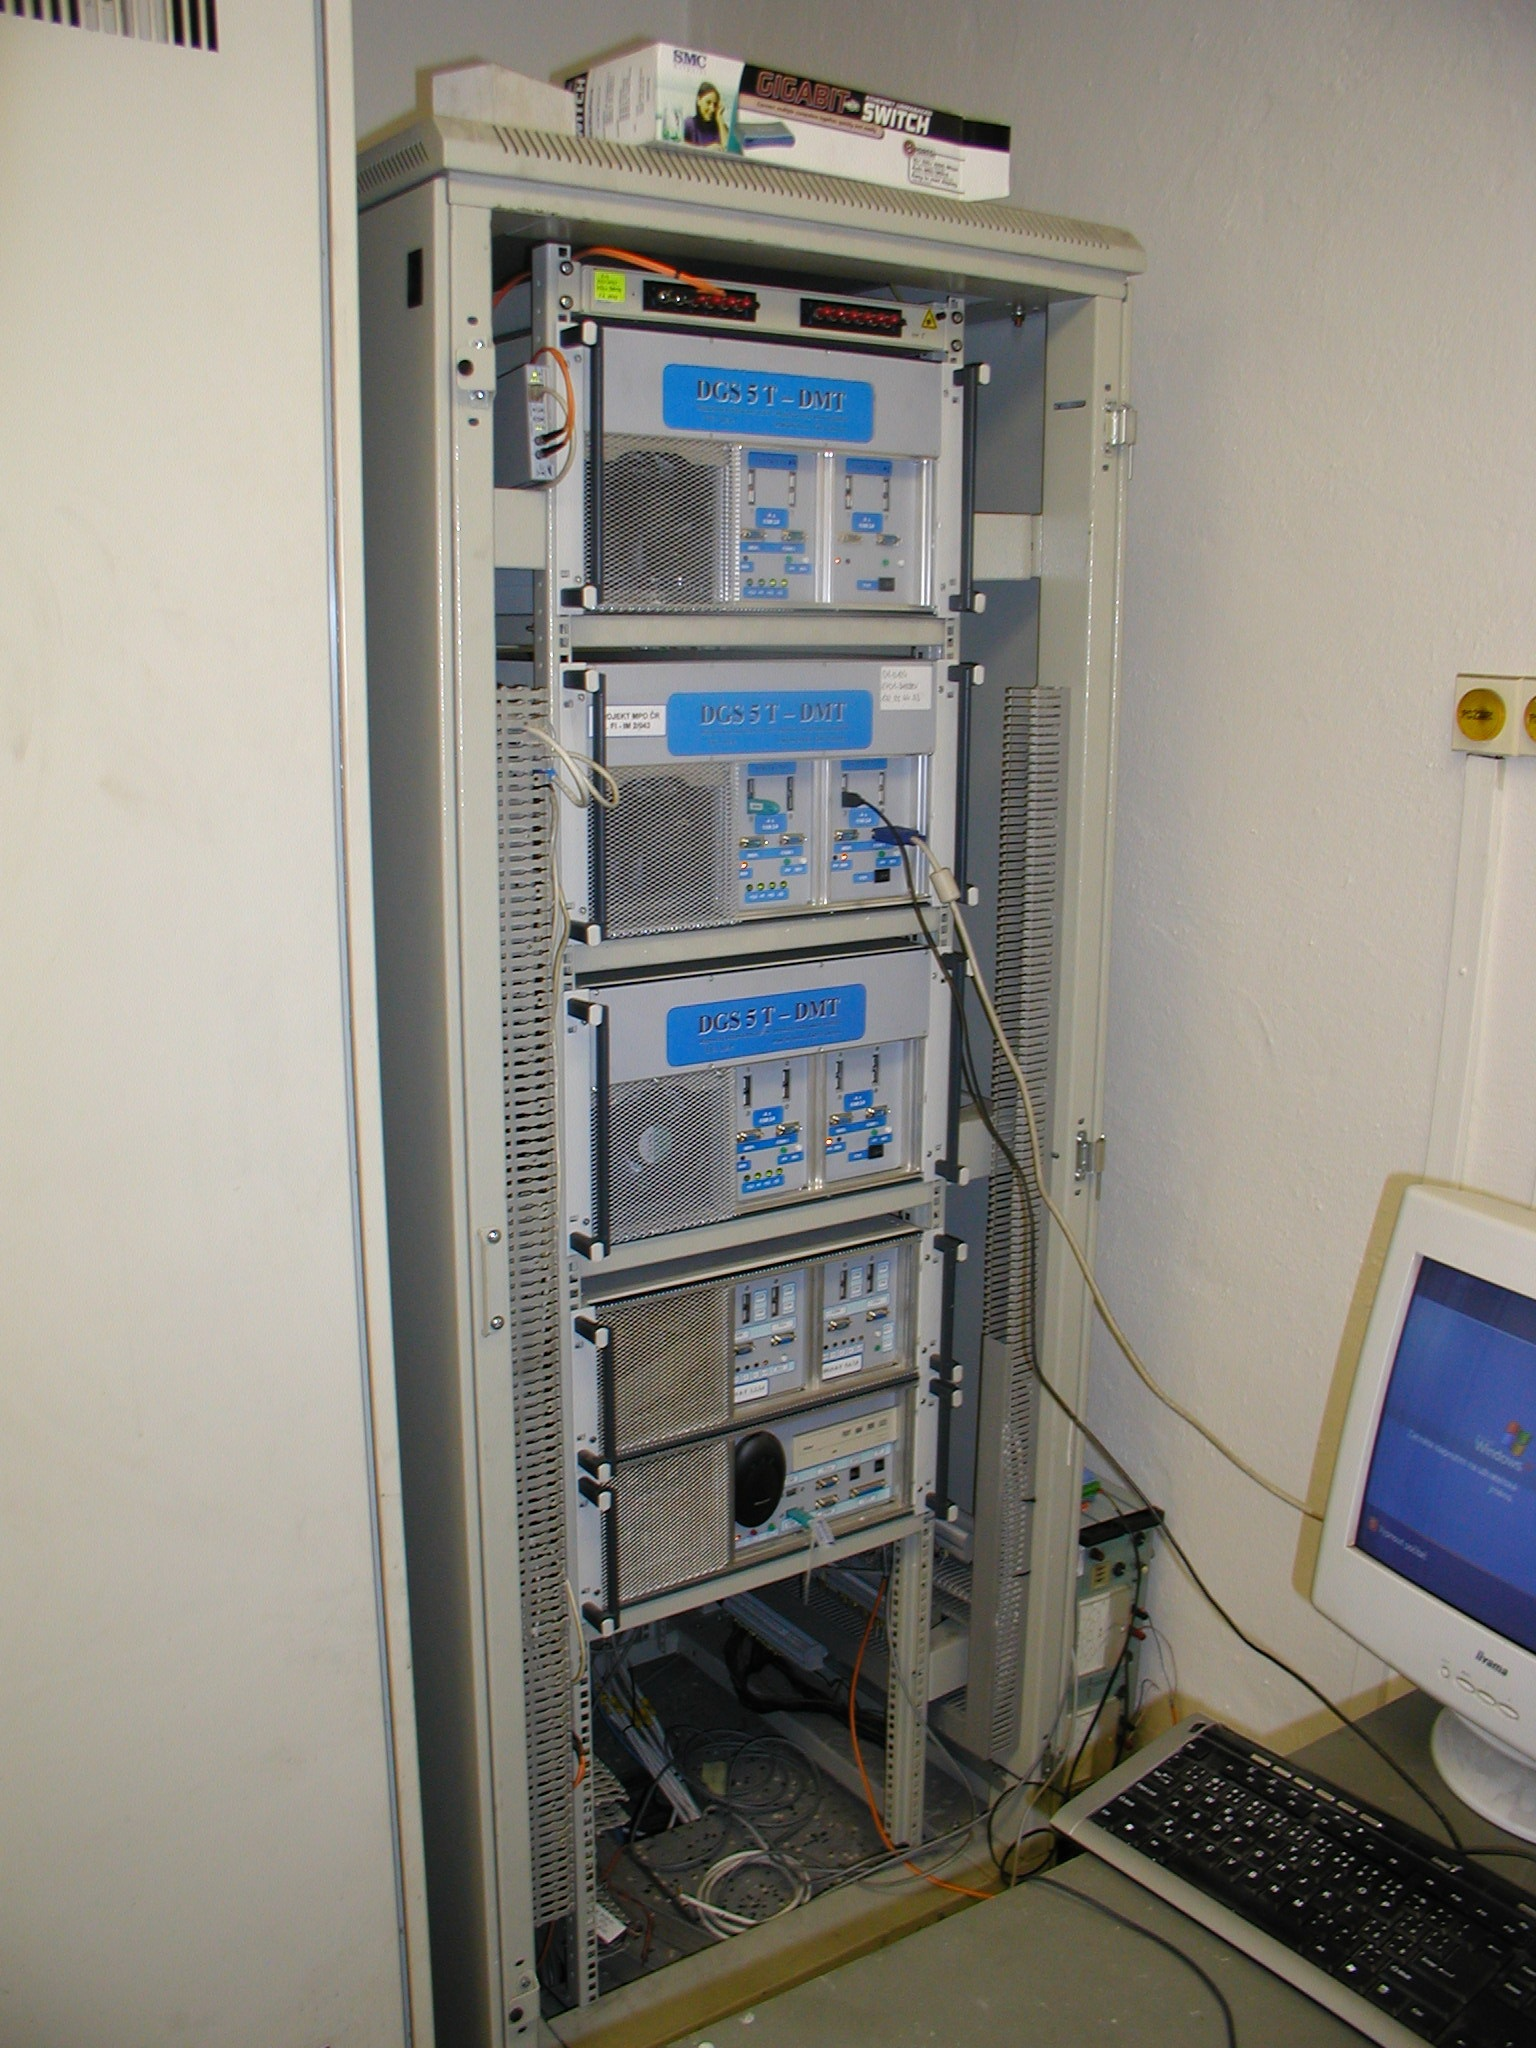 Pohled na skříň s elektronikou systému DGS - - - View of a rack with electronics of the DGS system